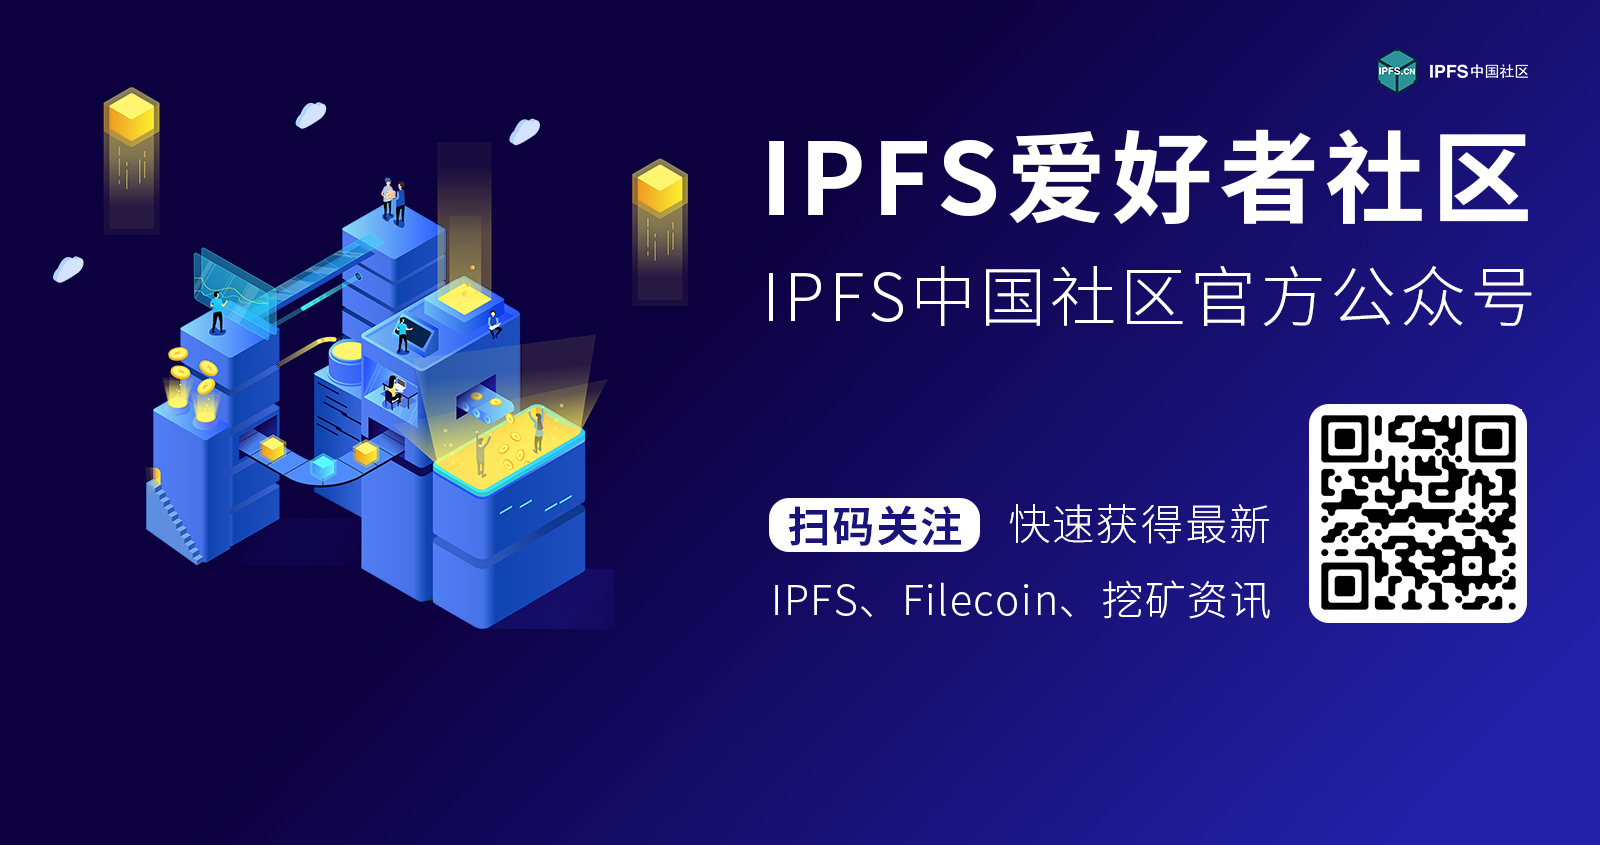 IPFS爱好者社区